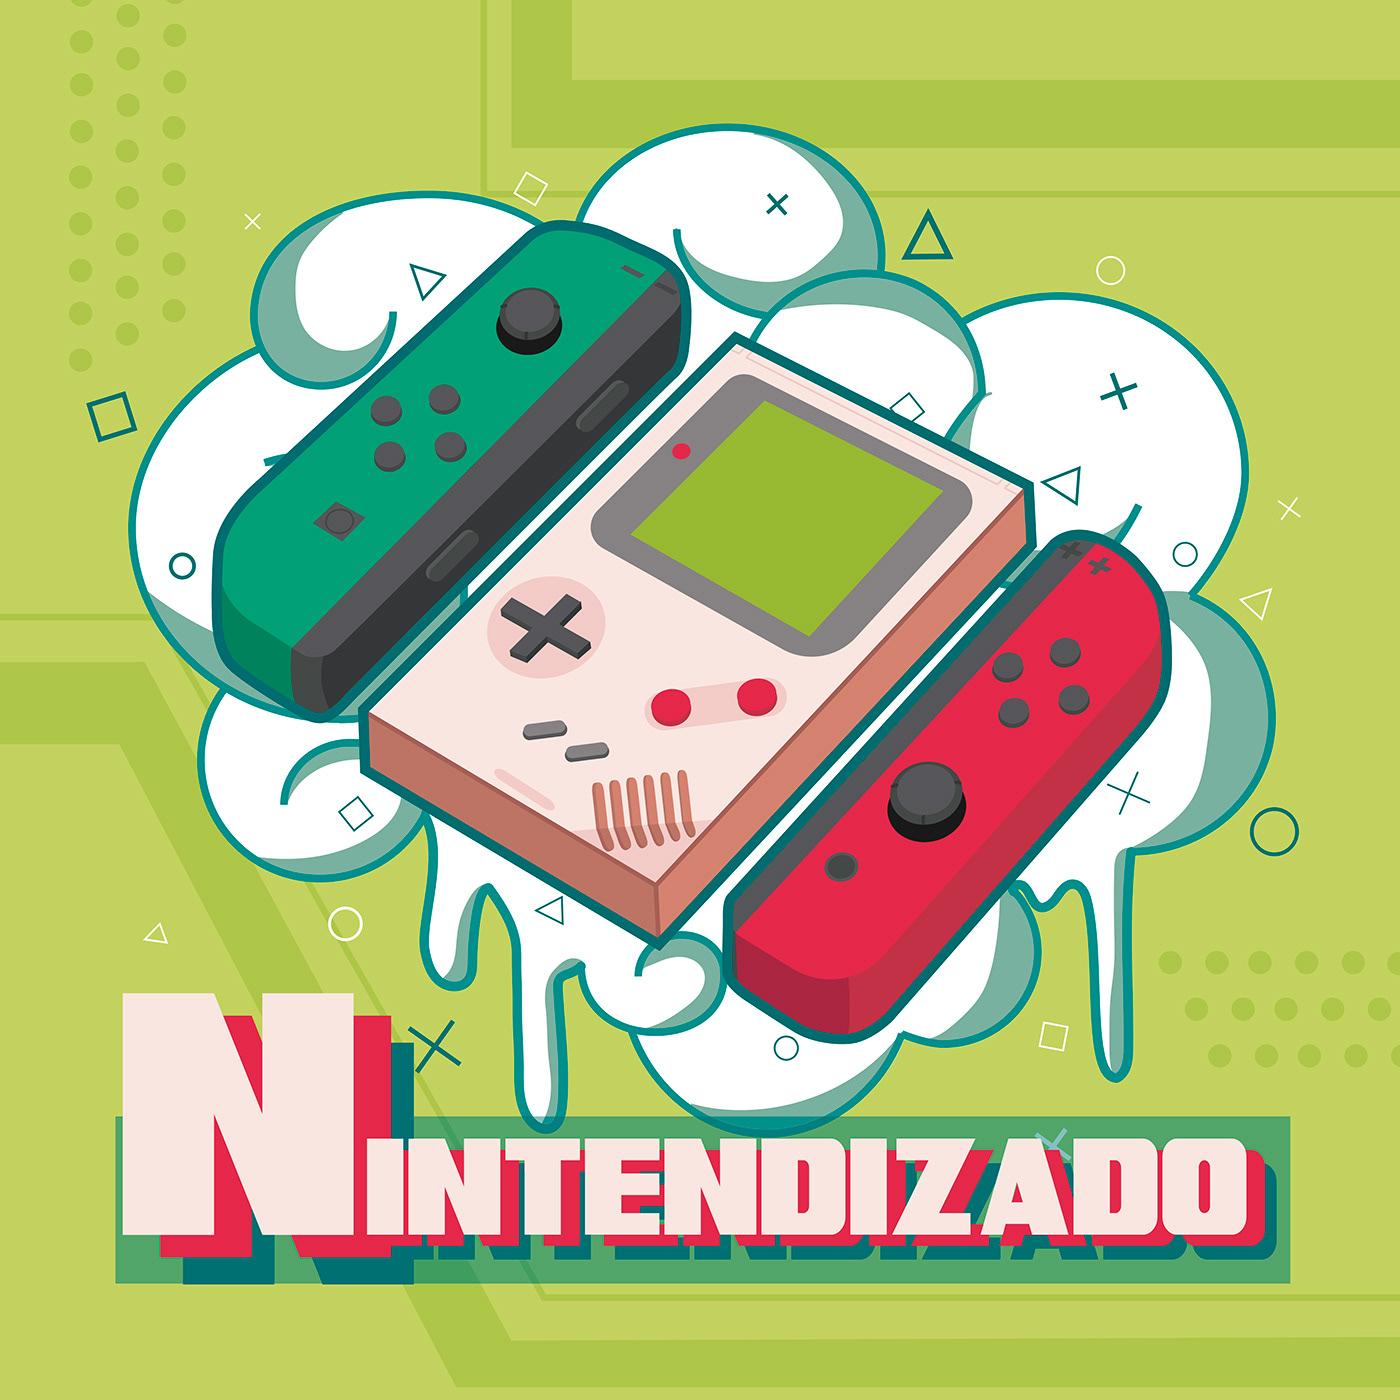 game ilustracion ilustration logo Nintendo podcast